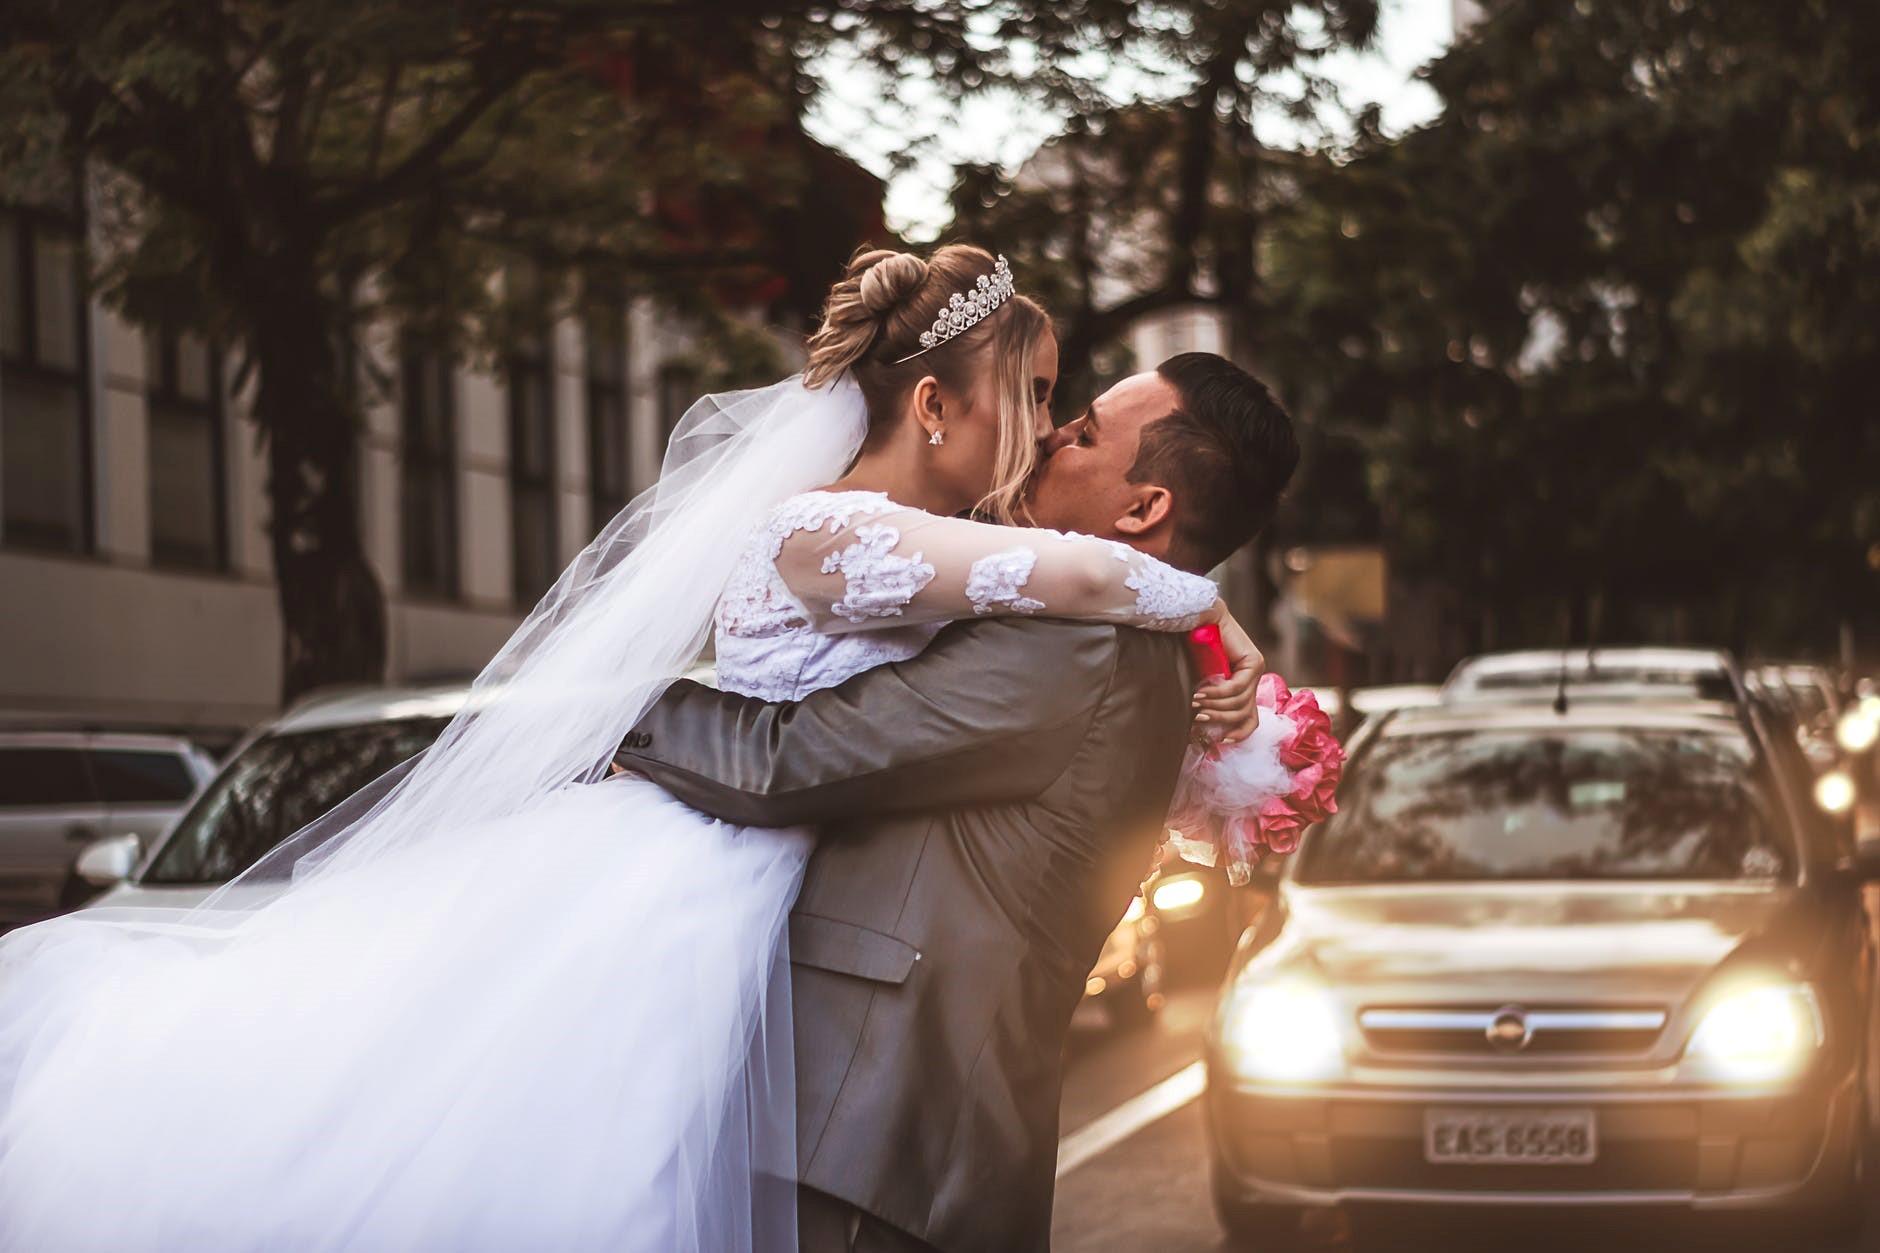 Eastern European brides